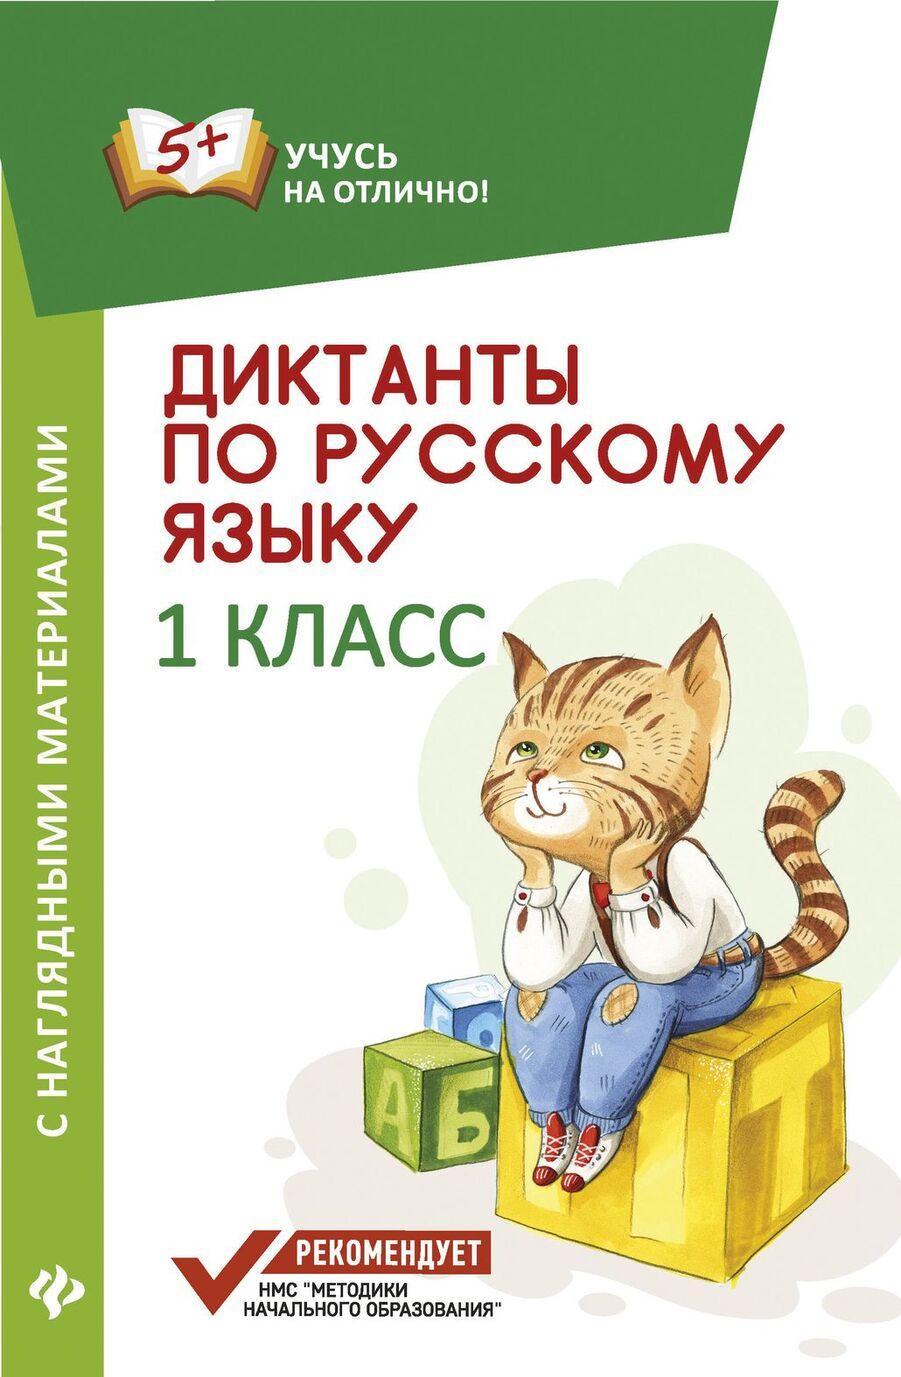 Diktanty po russkomu jazyku s nagl.mater.:1 klass d